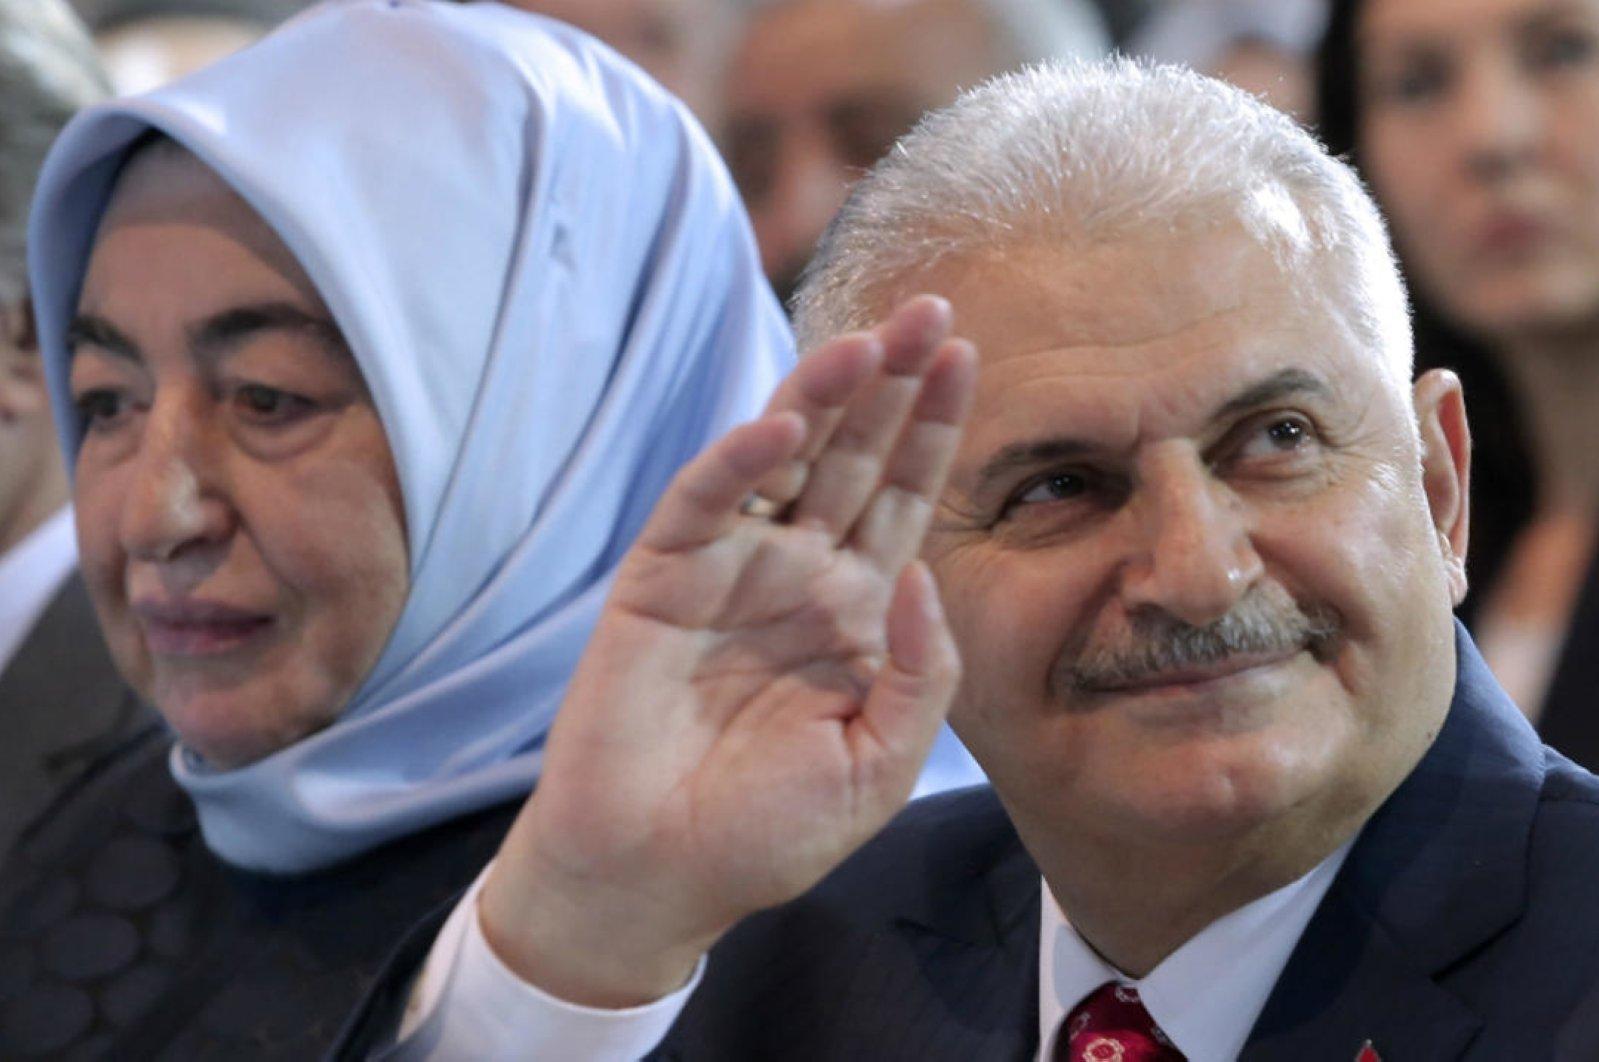 Former Prime Minister and AK Party Izmir deputy Binali Yıldırım (R) and his wife Semiha Yıldırım (L) during a congress of his party in Ankara, Turkey, May 22, 2016. (AFP Photo)